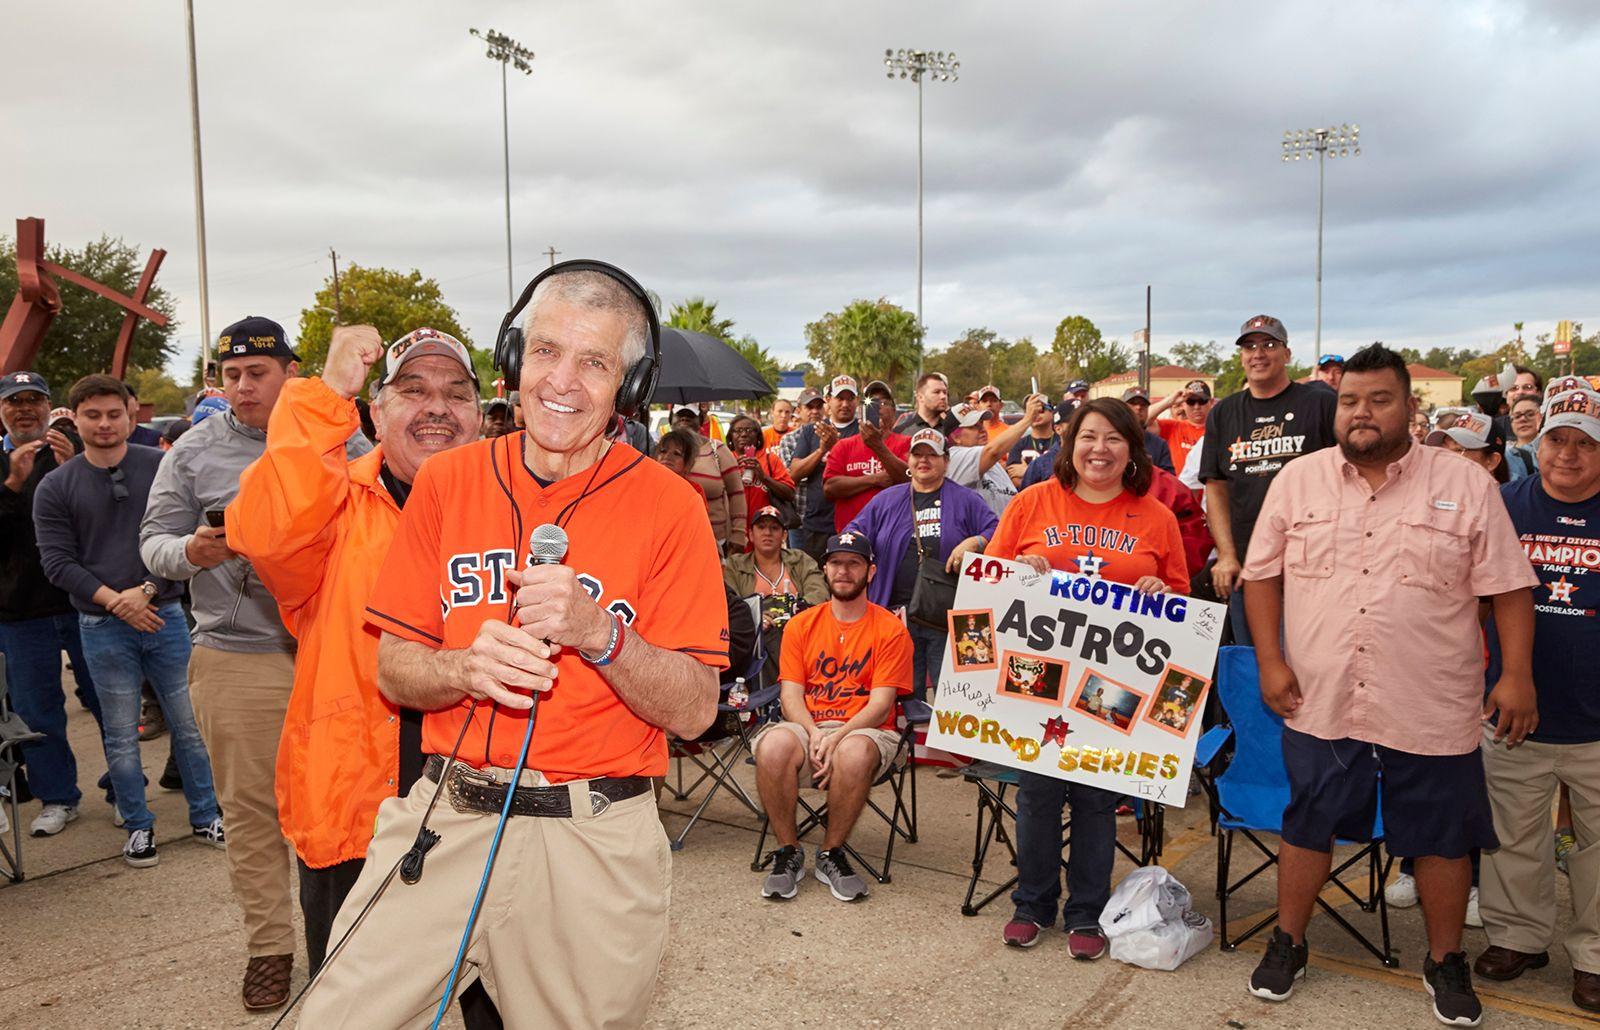 Mattress Mack and Houston community members celebrate the Astros